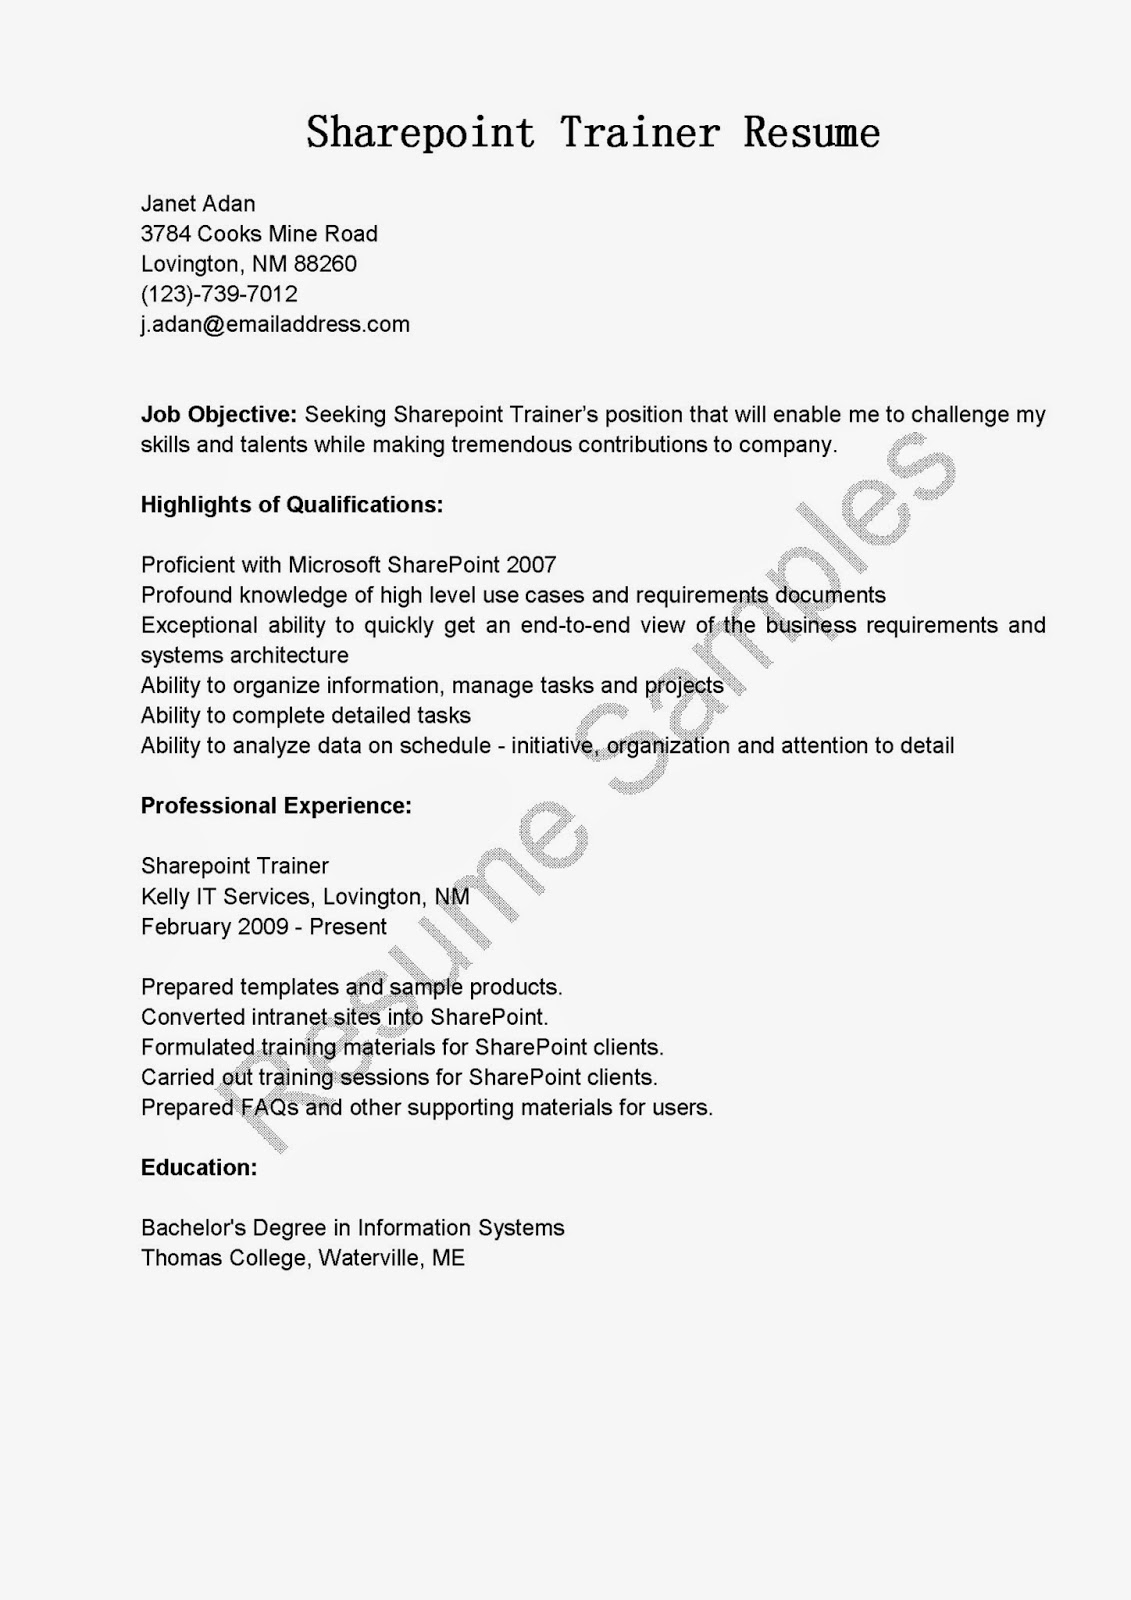 28+ [ Sample Resume Sharepoint Experience ] | Resume Samples ...